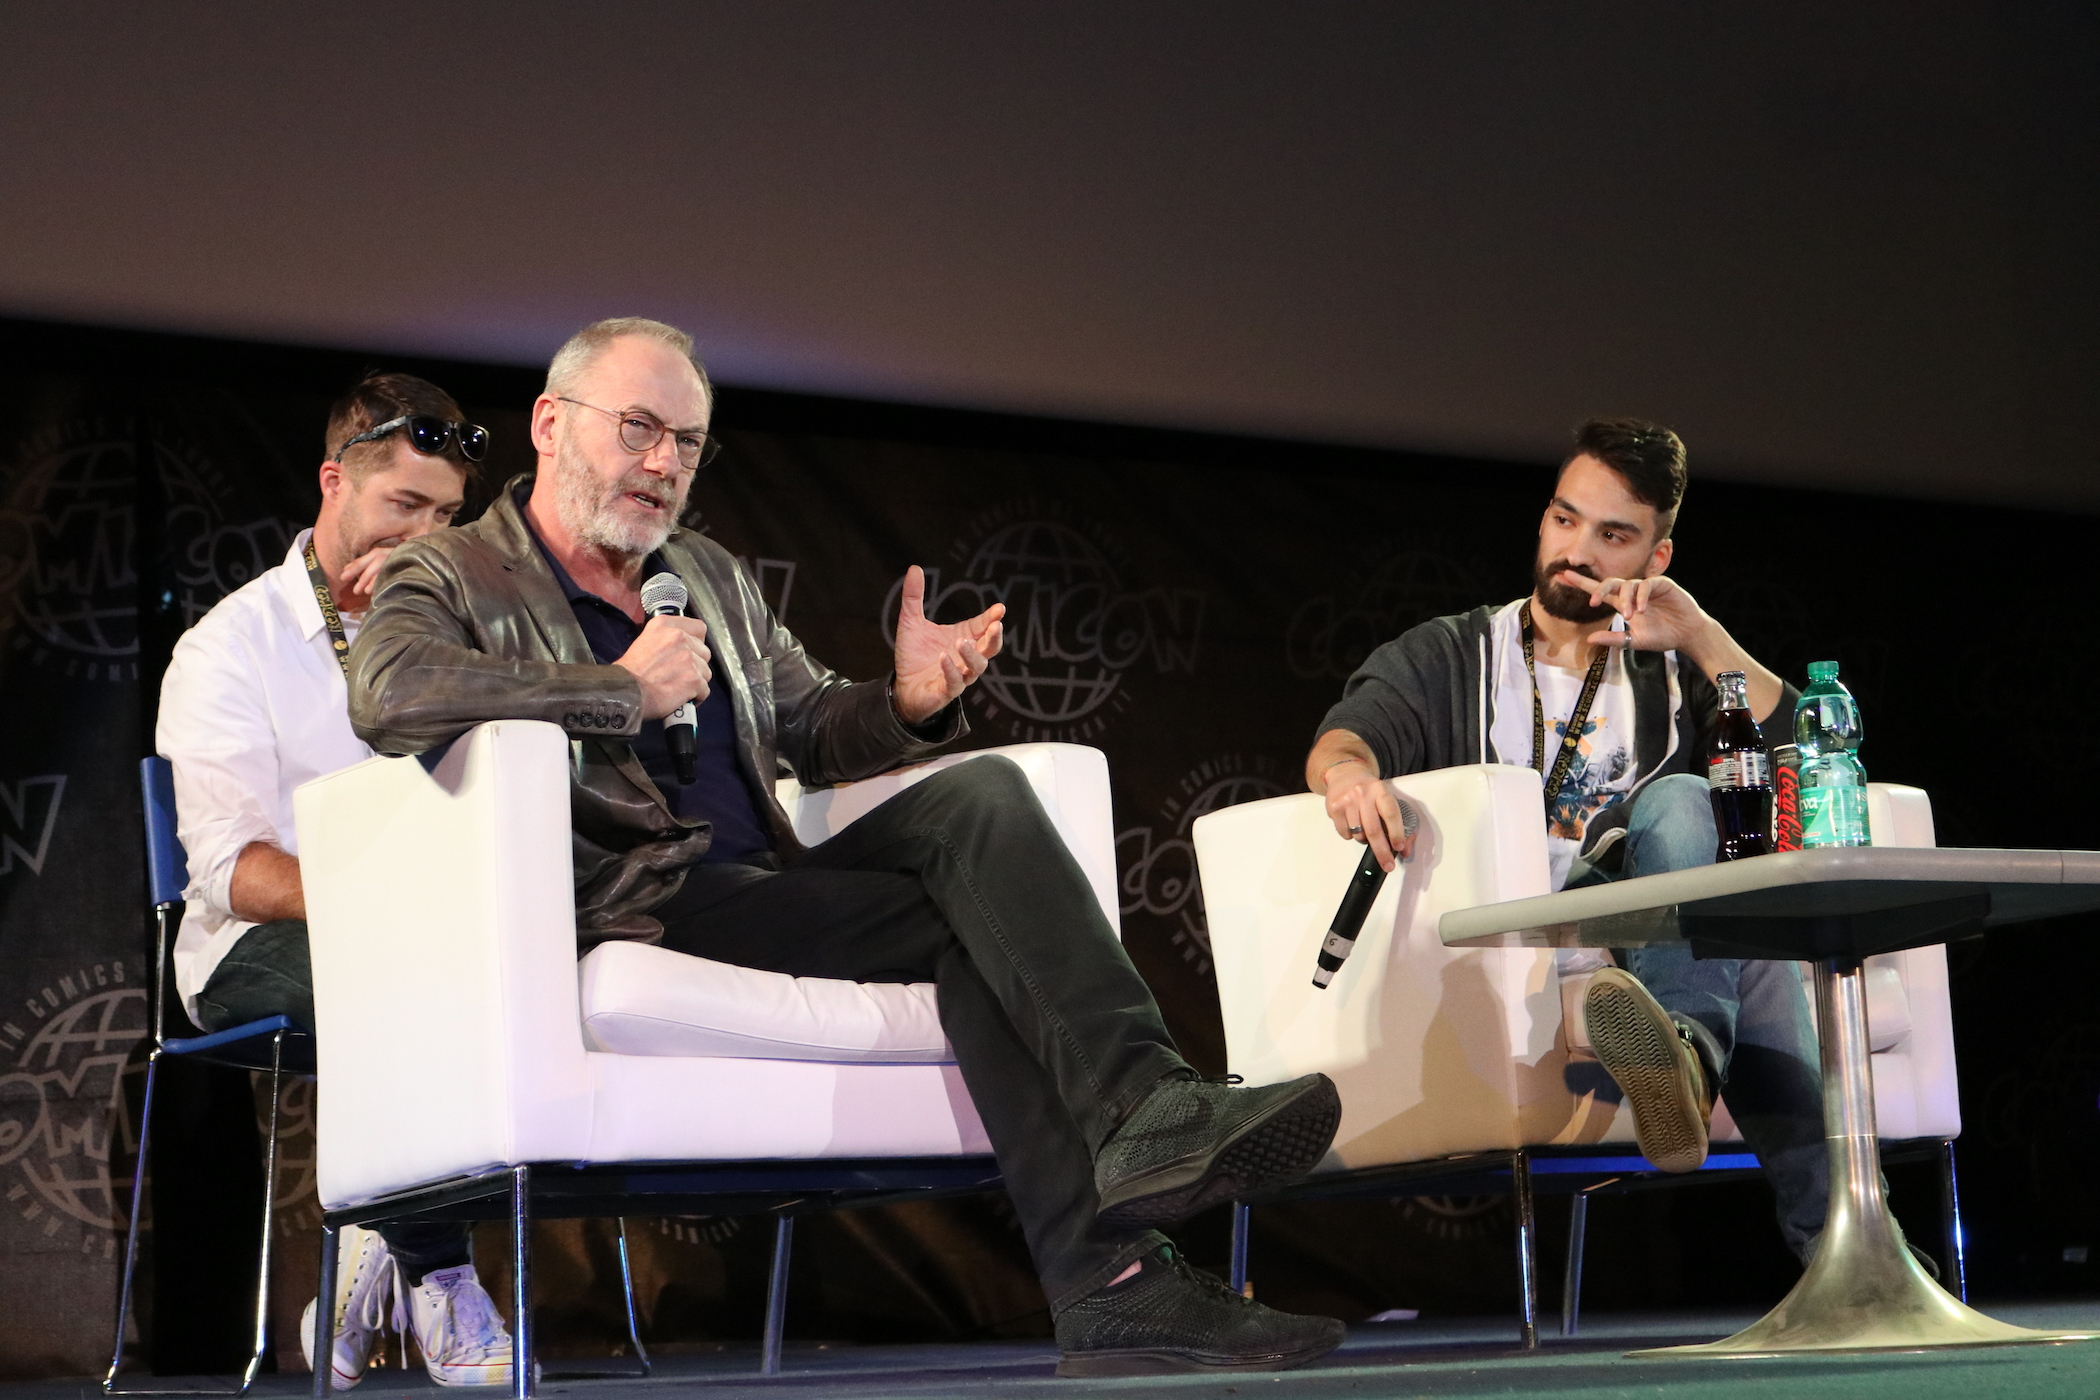 Comicon 2017: Liam Cunningham all'incontro